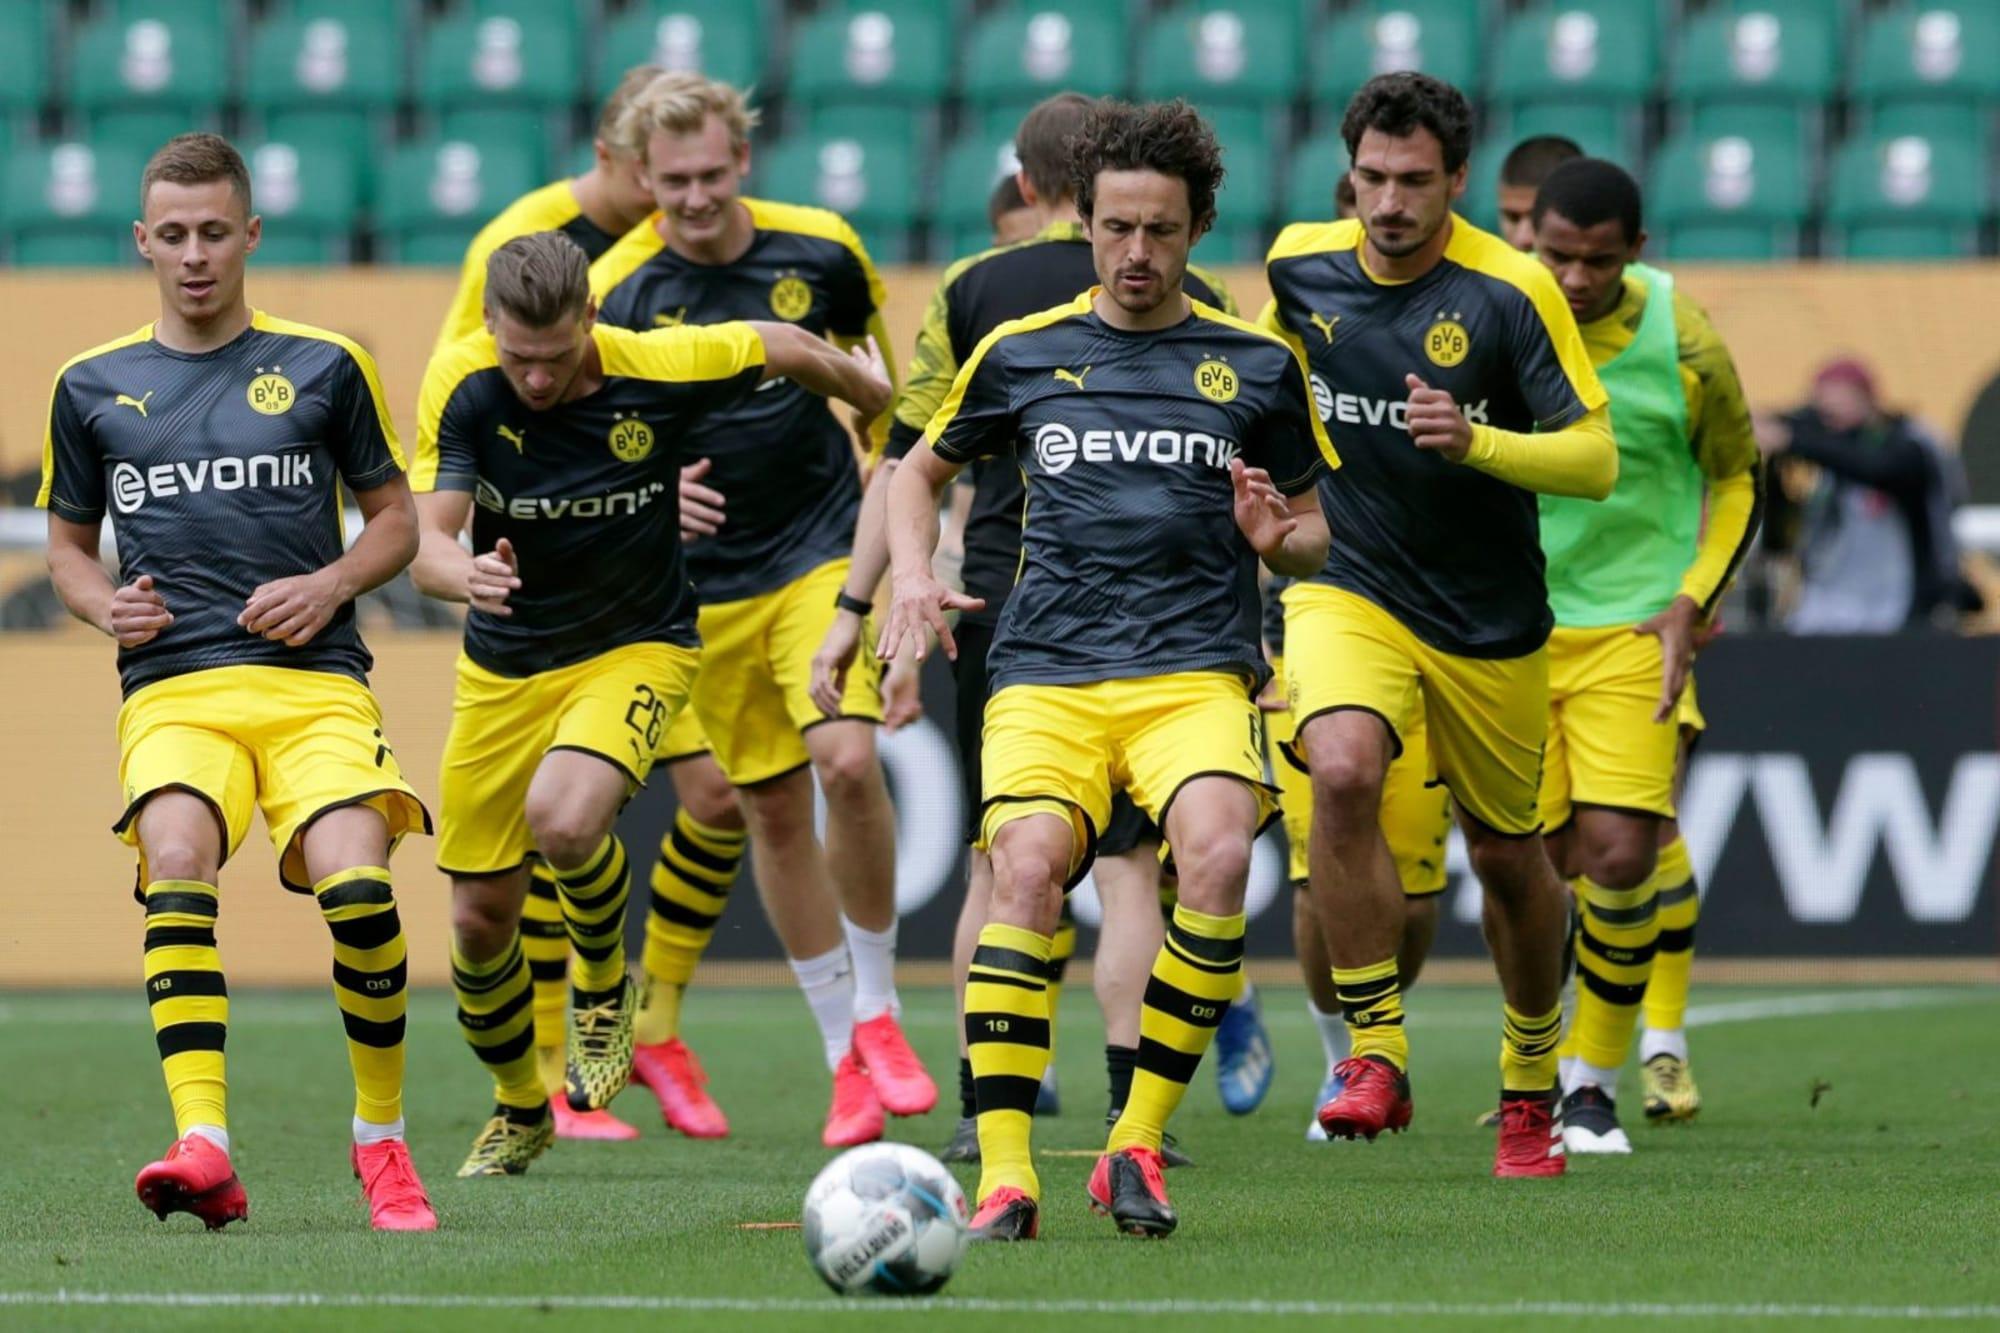 Borussia Dortmund release pre-season and fixture schedule for August